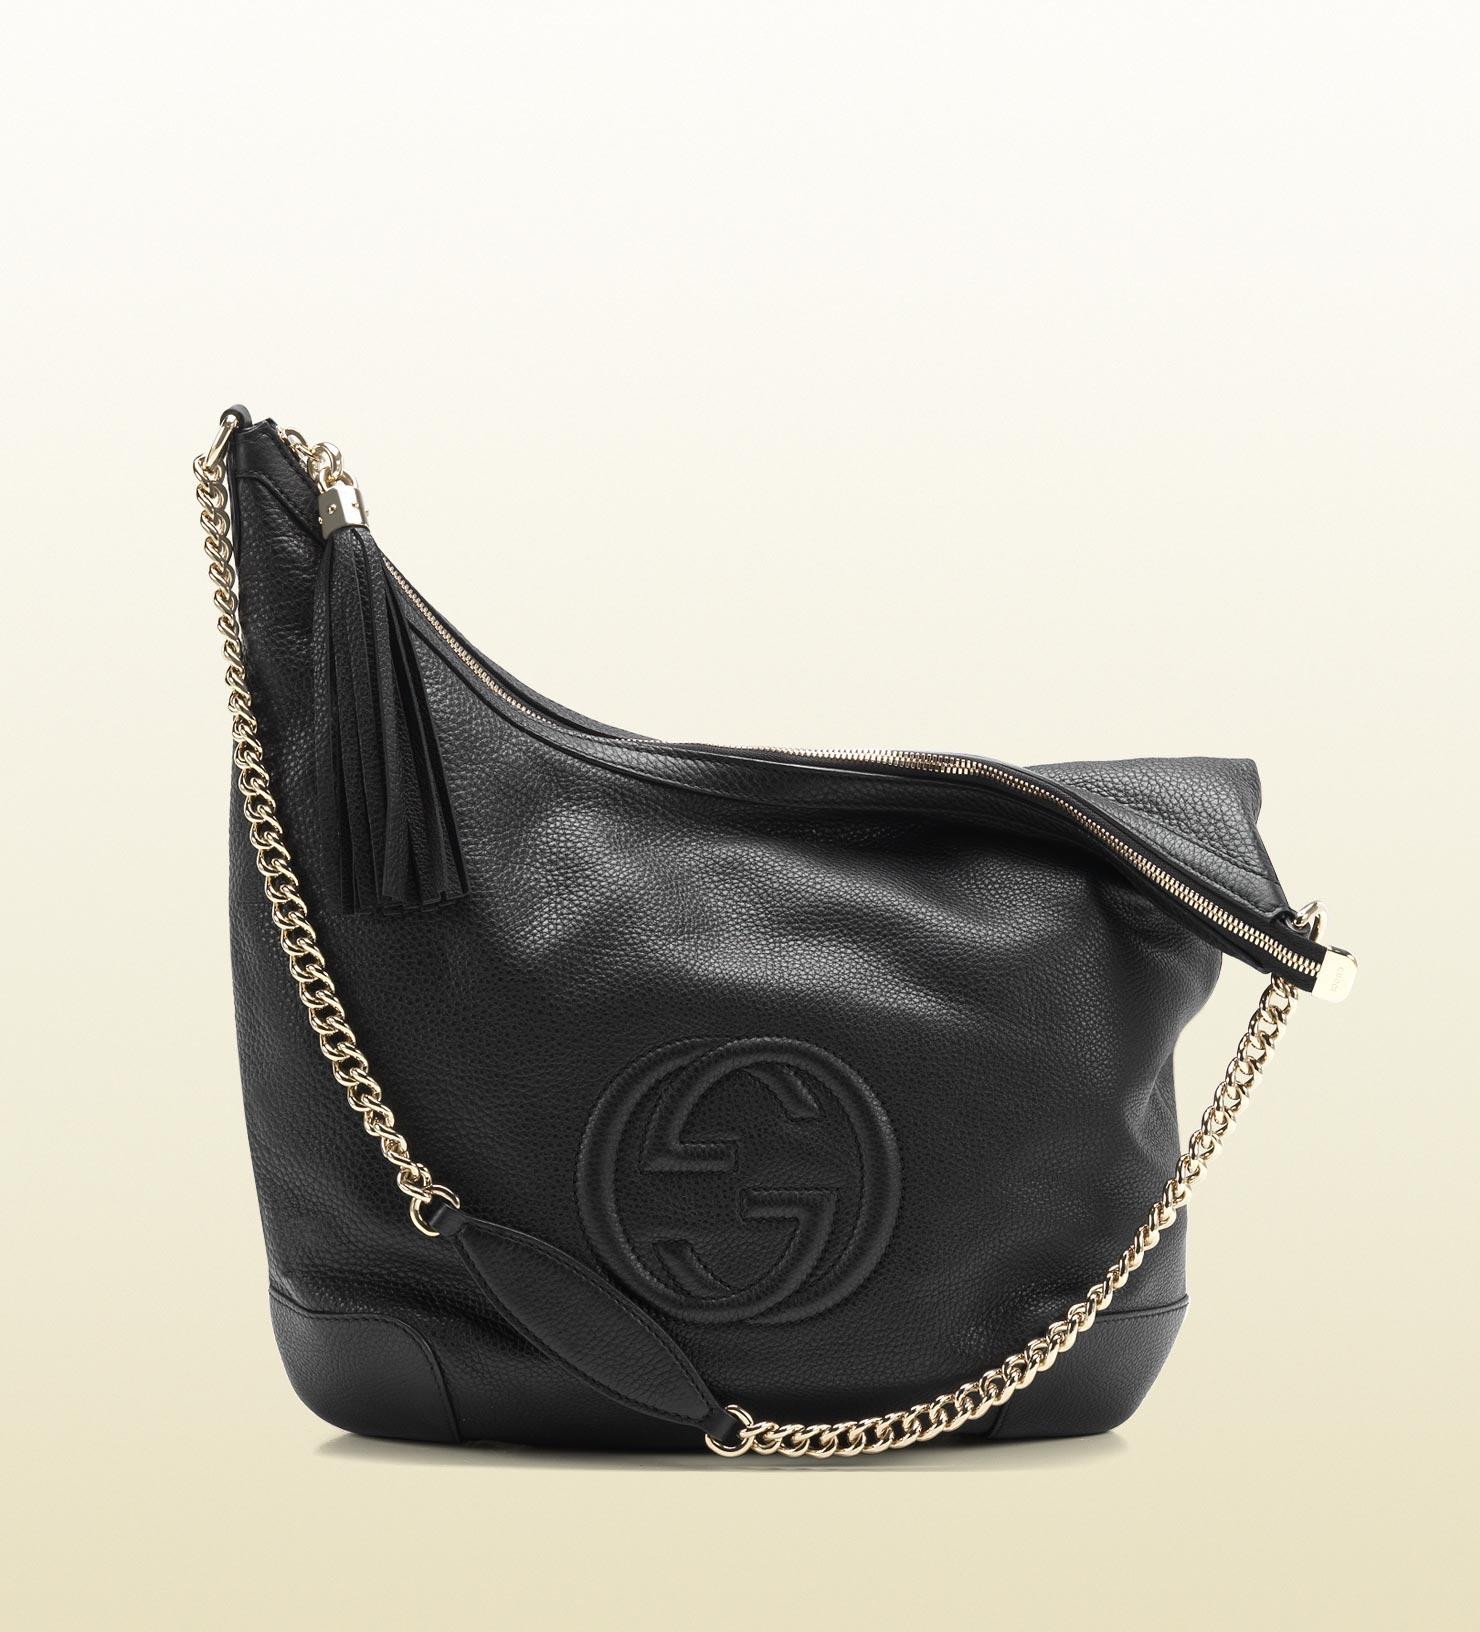 Gucci soho black leather shoulder bag with chain strap in black lyst for Black leather strap